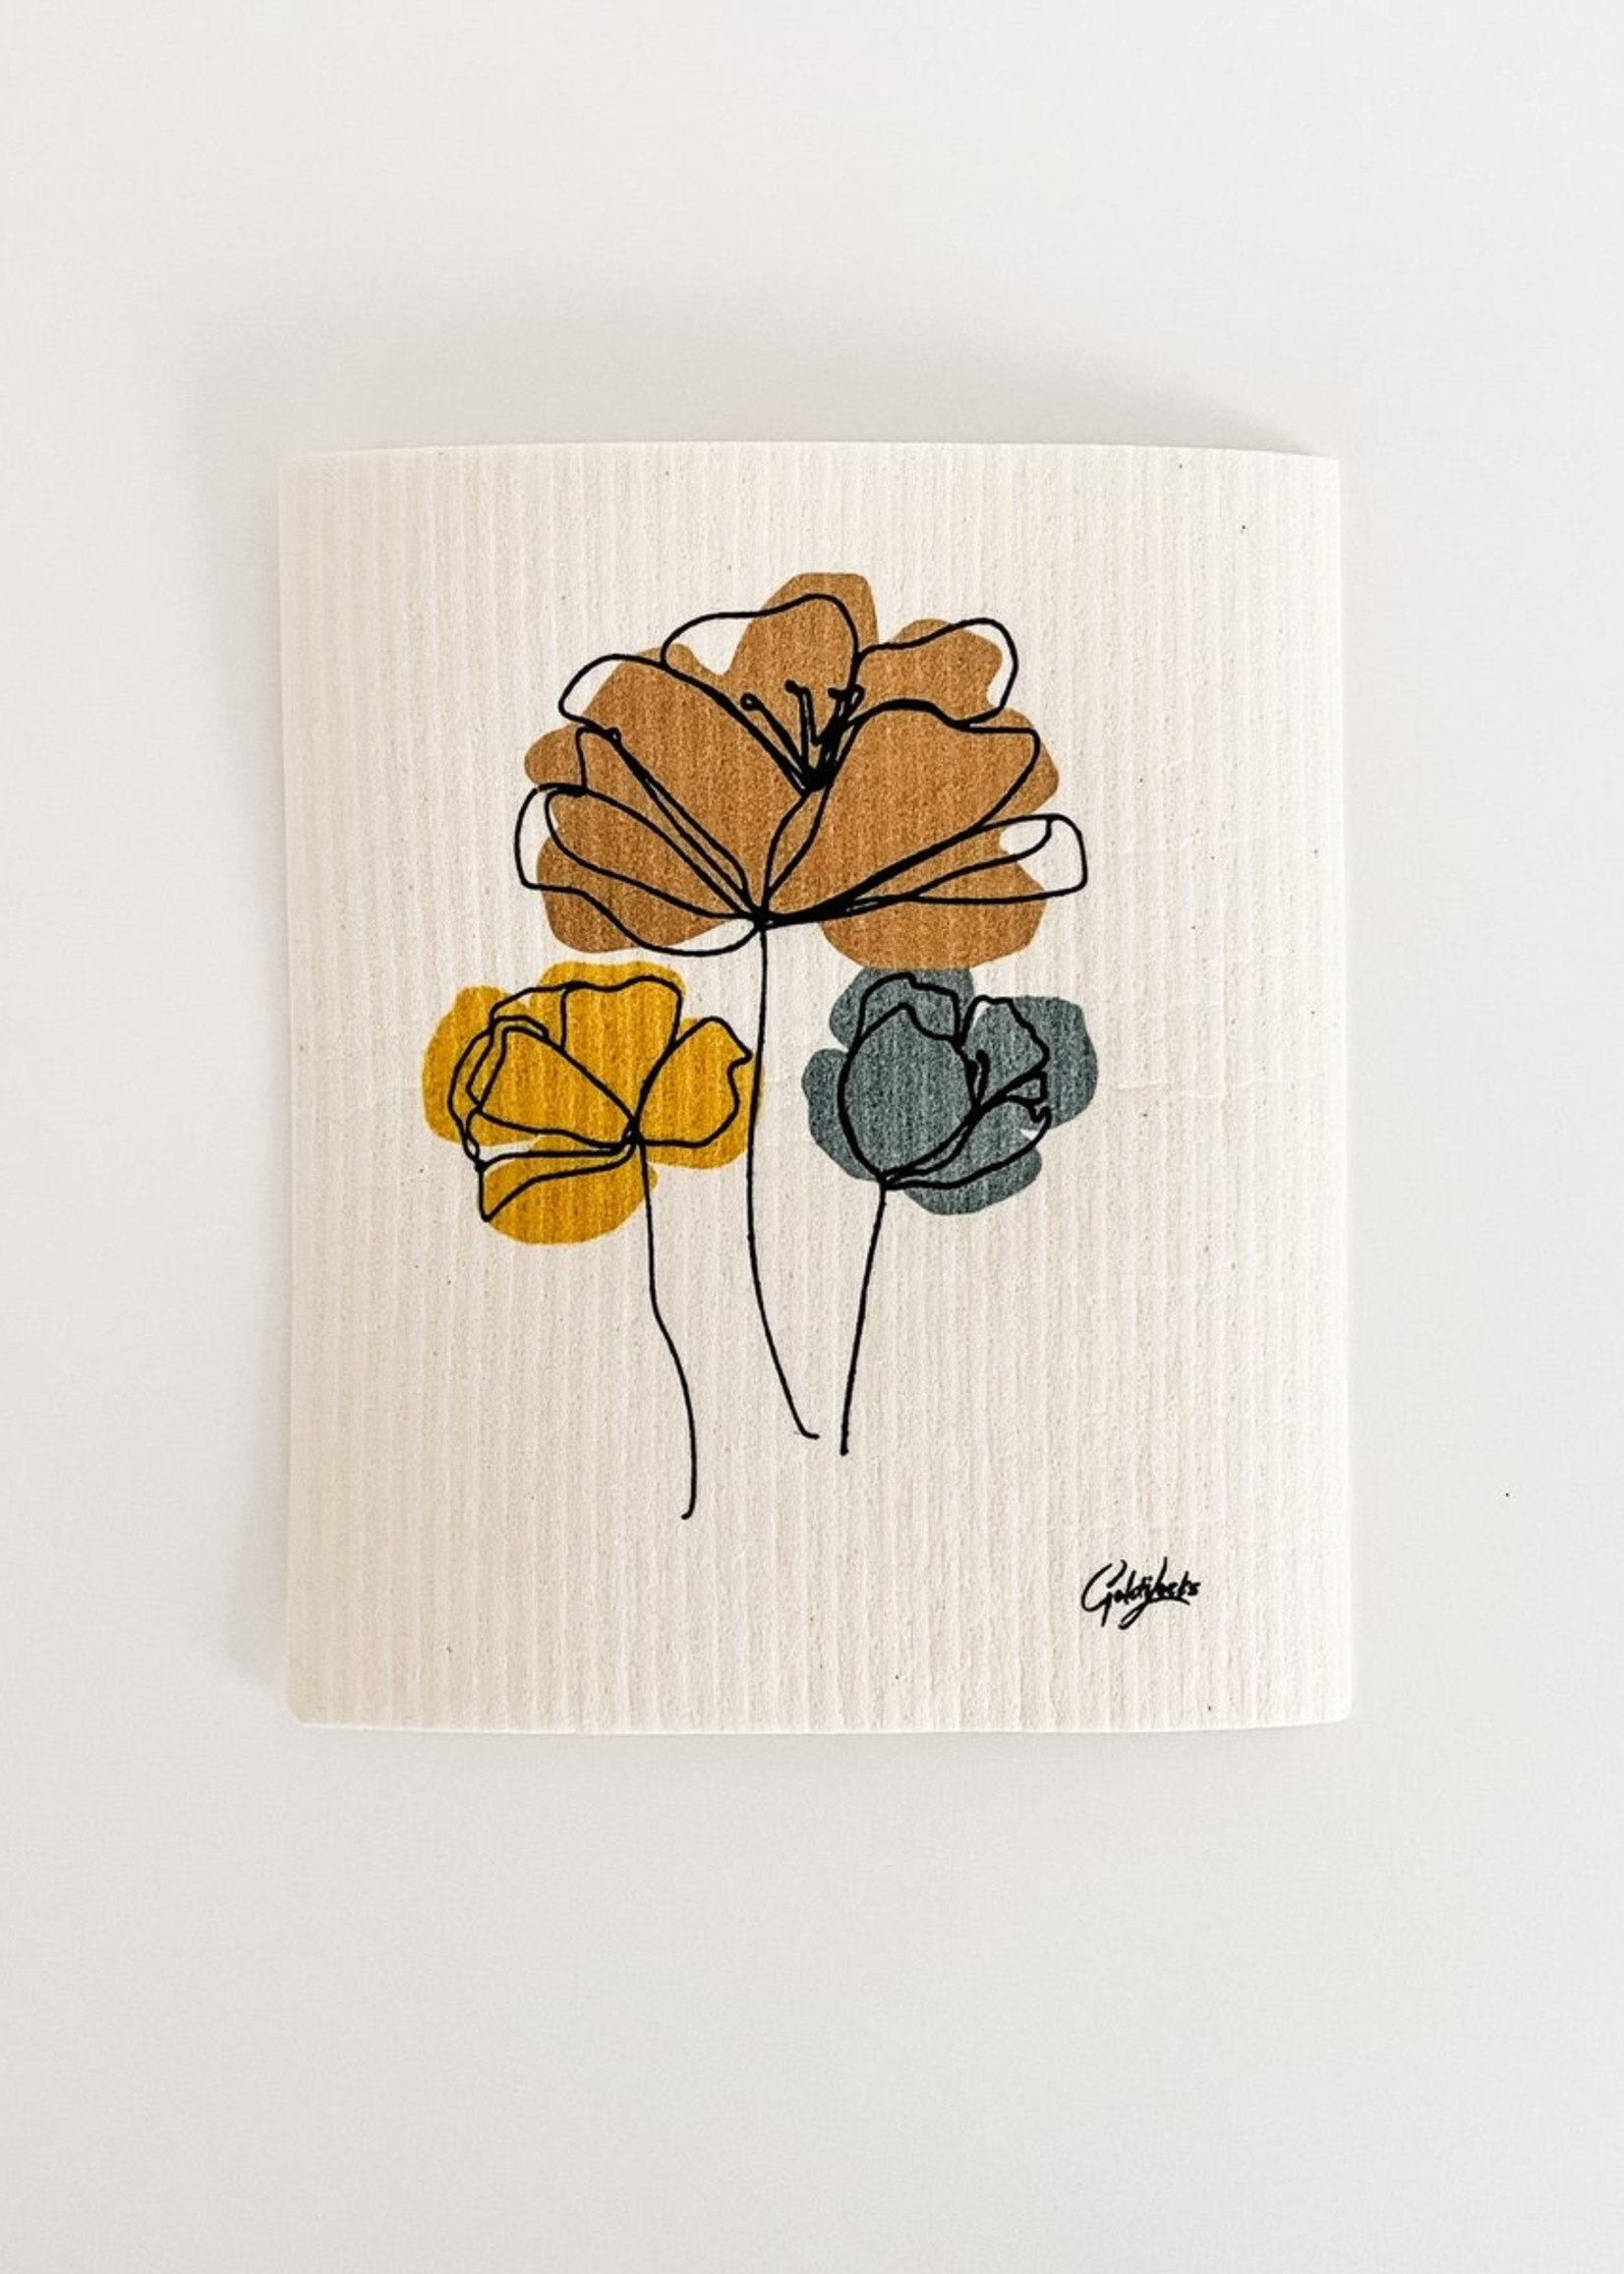 GOLDILOCKS wraps Swedish Dishcloth: Harvest Bouquet